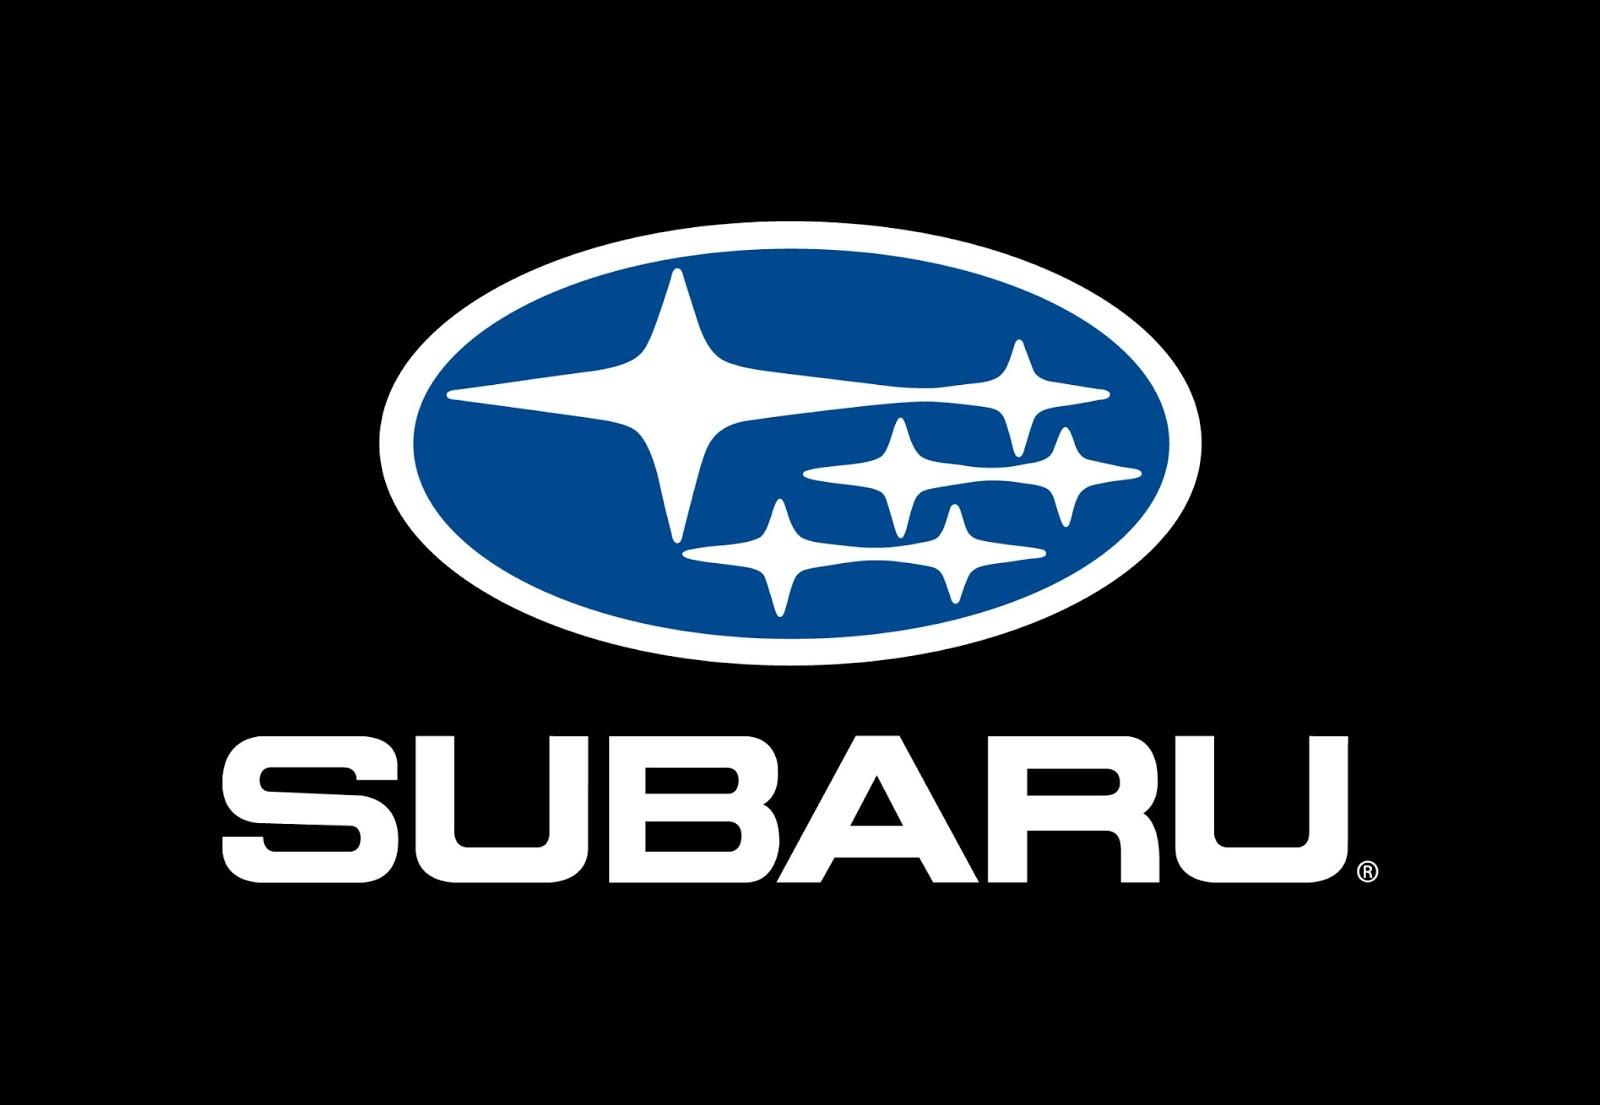 subaru logo decalsubaru logo fontsubaru logo wallpapersubaru logo 1600x1105